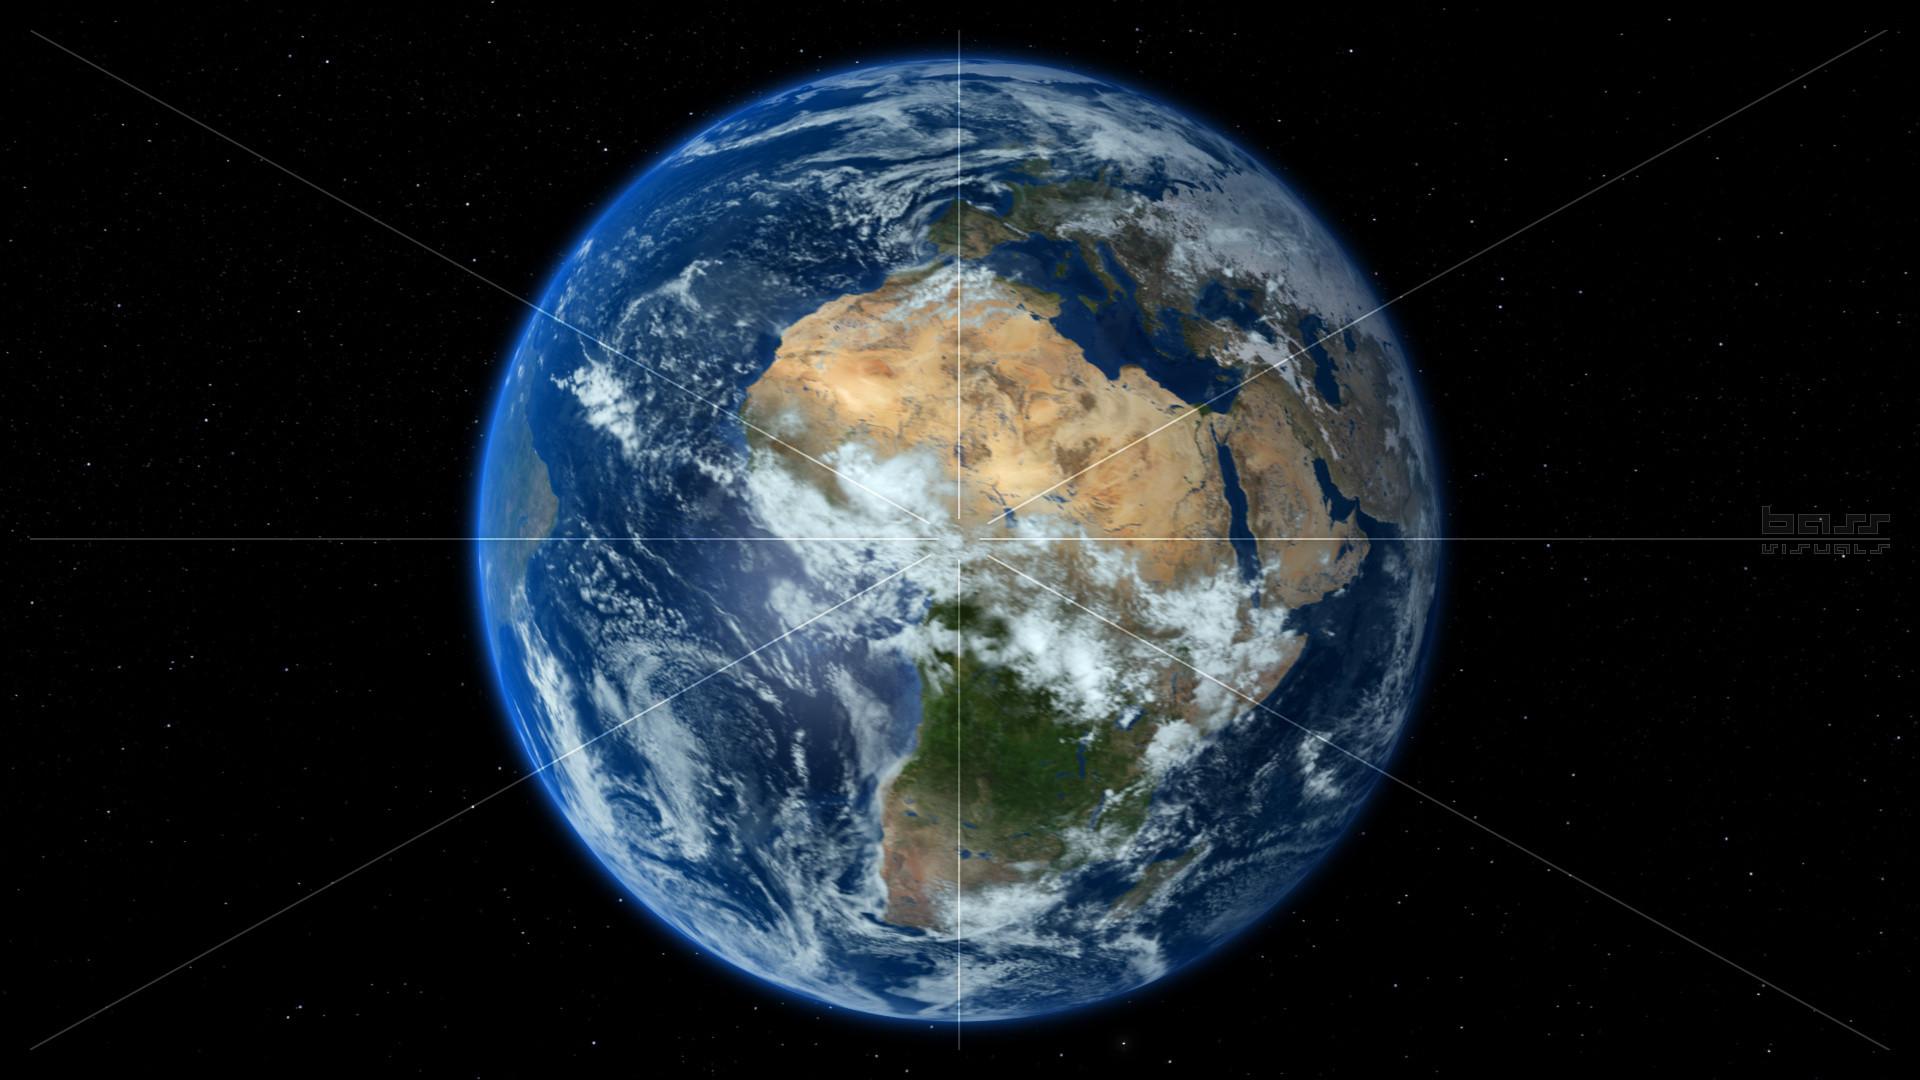 Black Earth Wallpaper 26 Desktop Background. Black Earth Wallpaper 26  Desktop Background. …